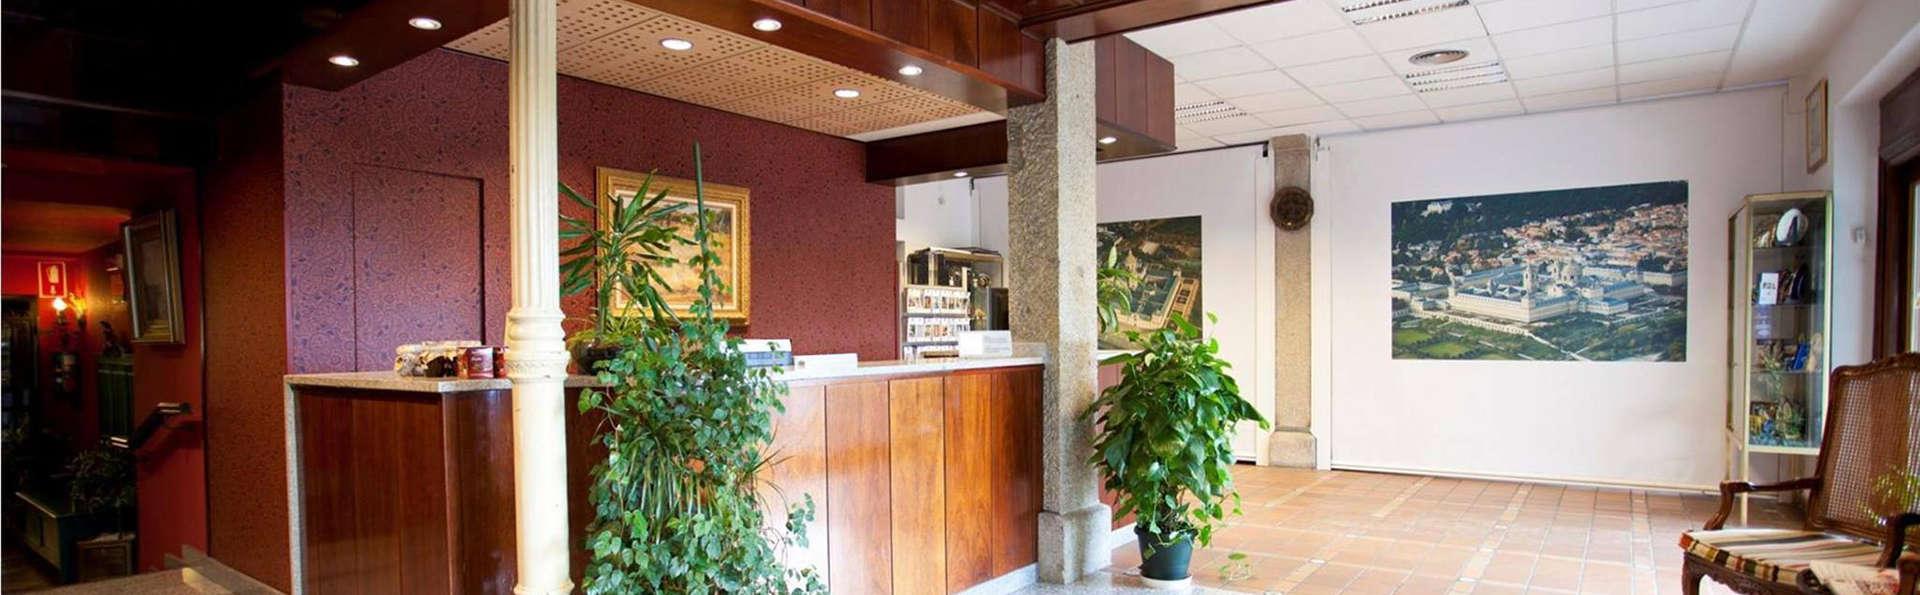 Sercotel Hotel Florida - EDIT_reception.jpg